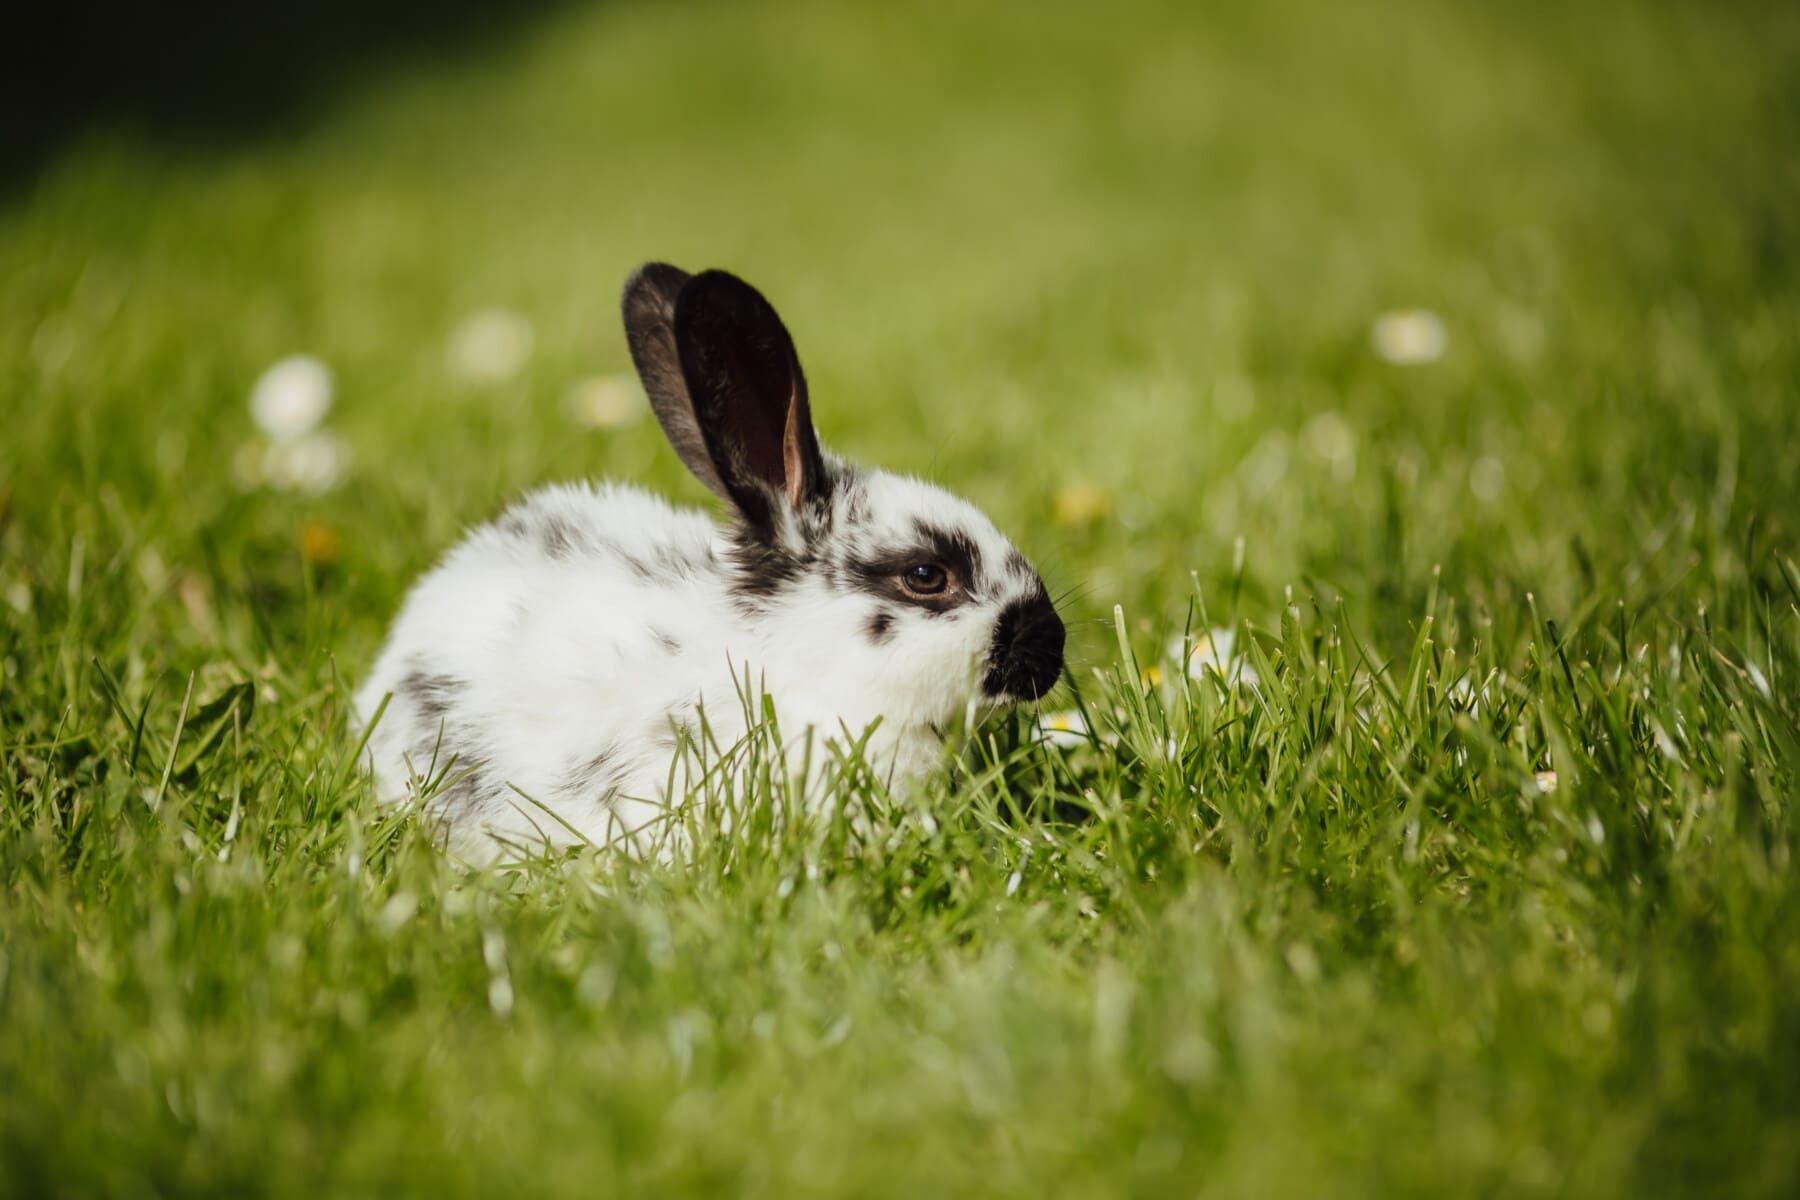 Hase, grünes Gras, aus nächster Nähe, Ohr, liebenswert, Haustier, Tiere, Nagetier, Pelz, Bunny